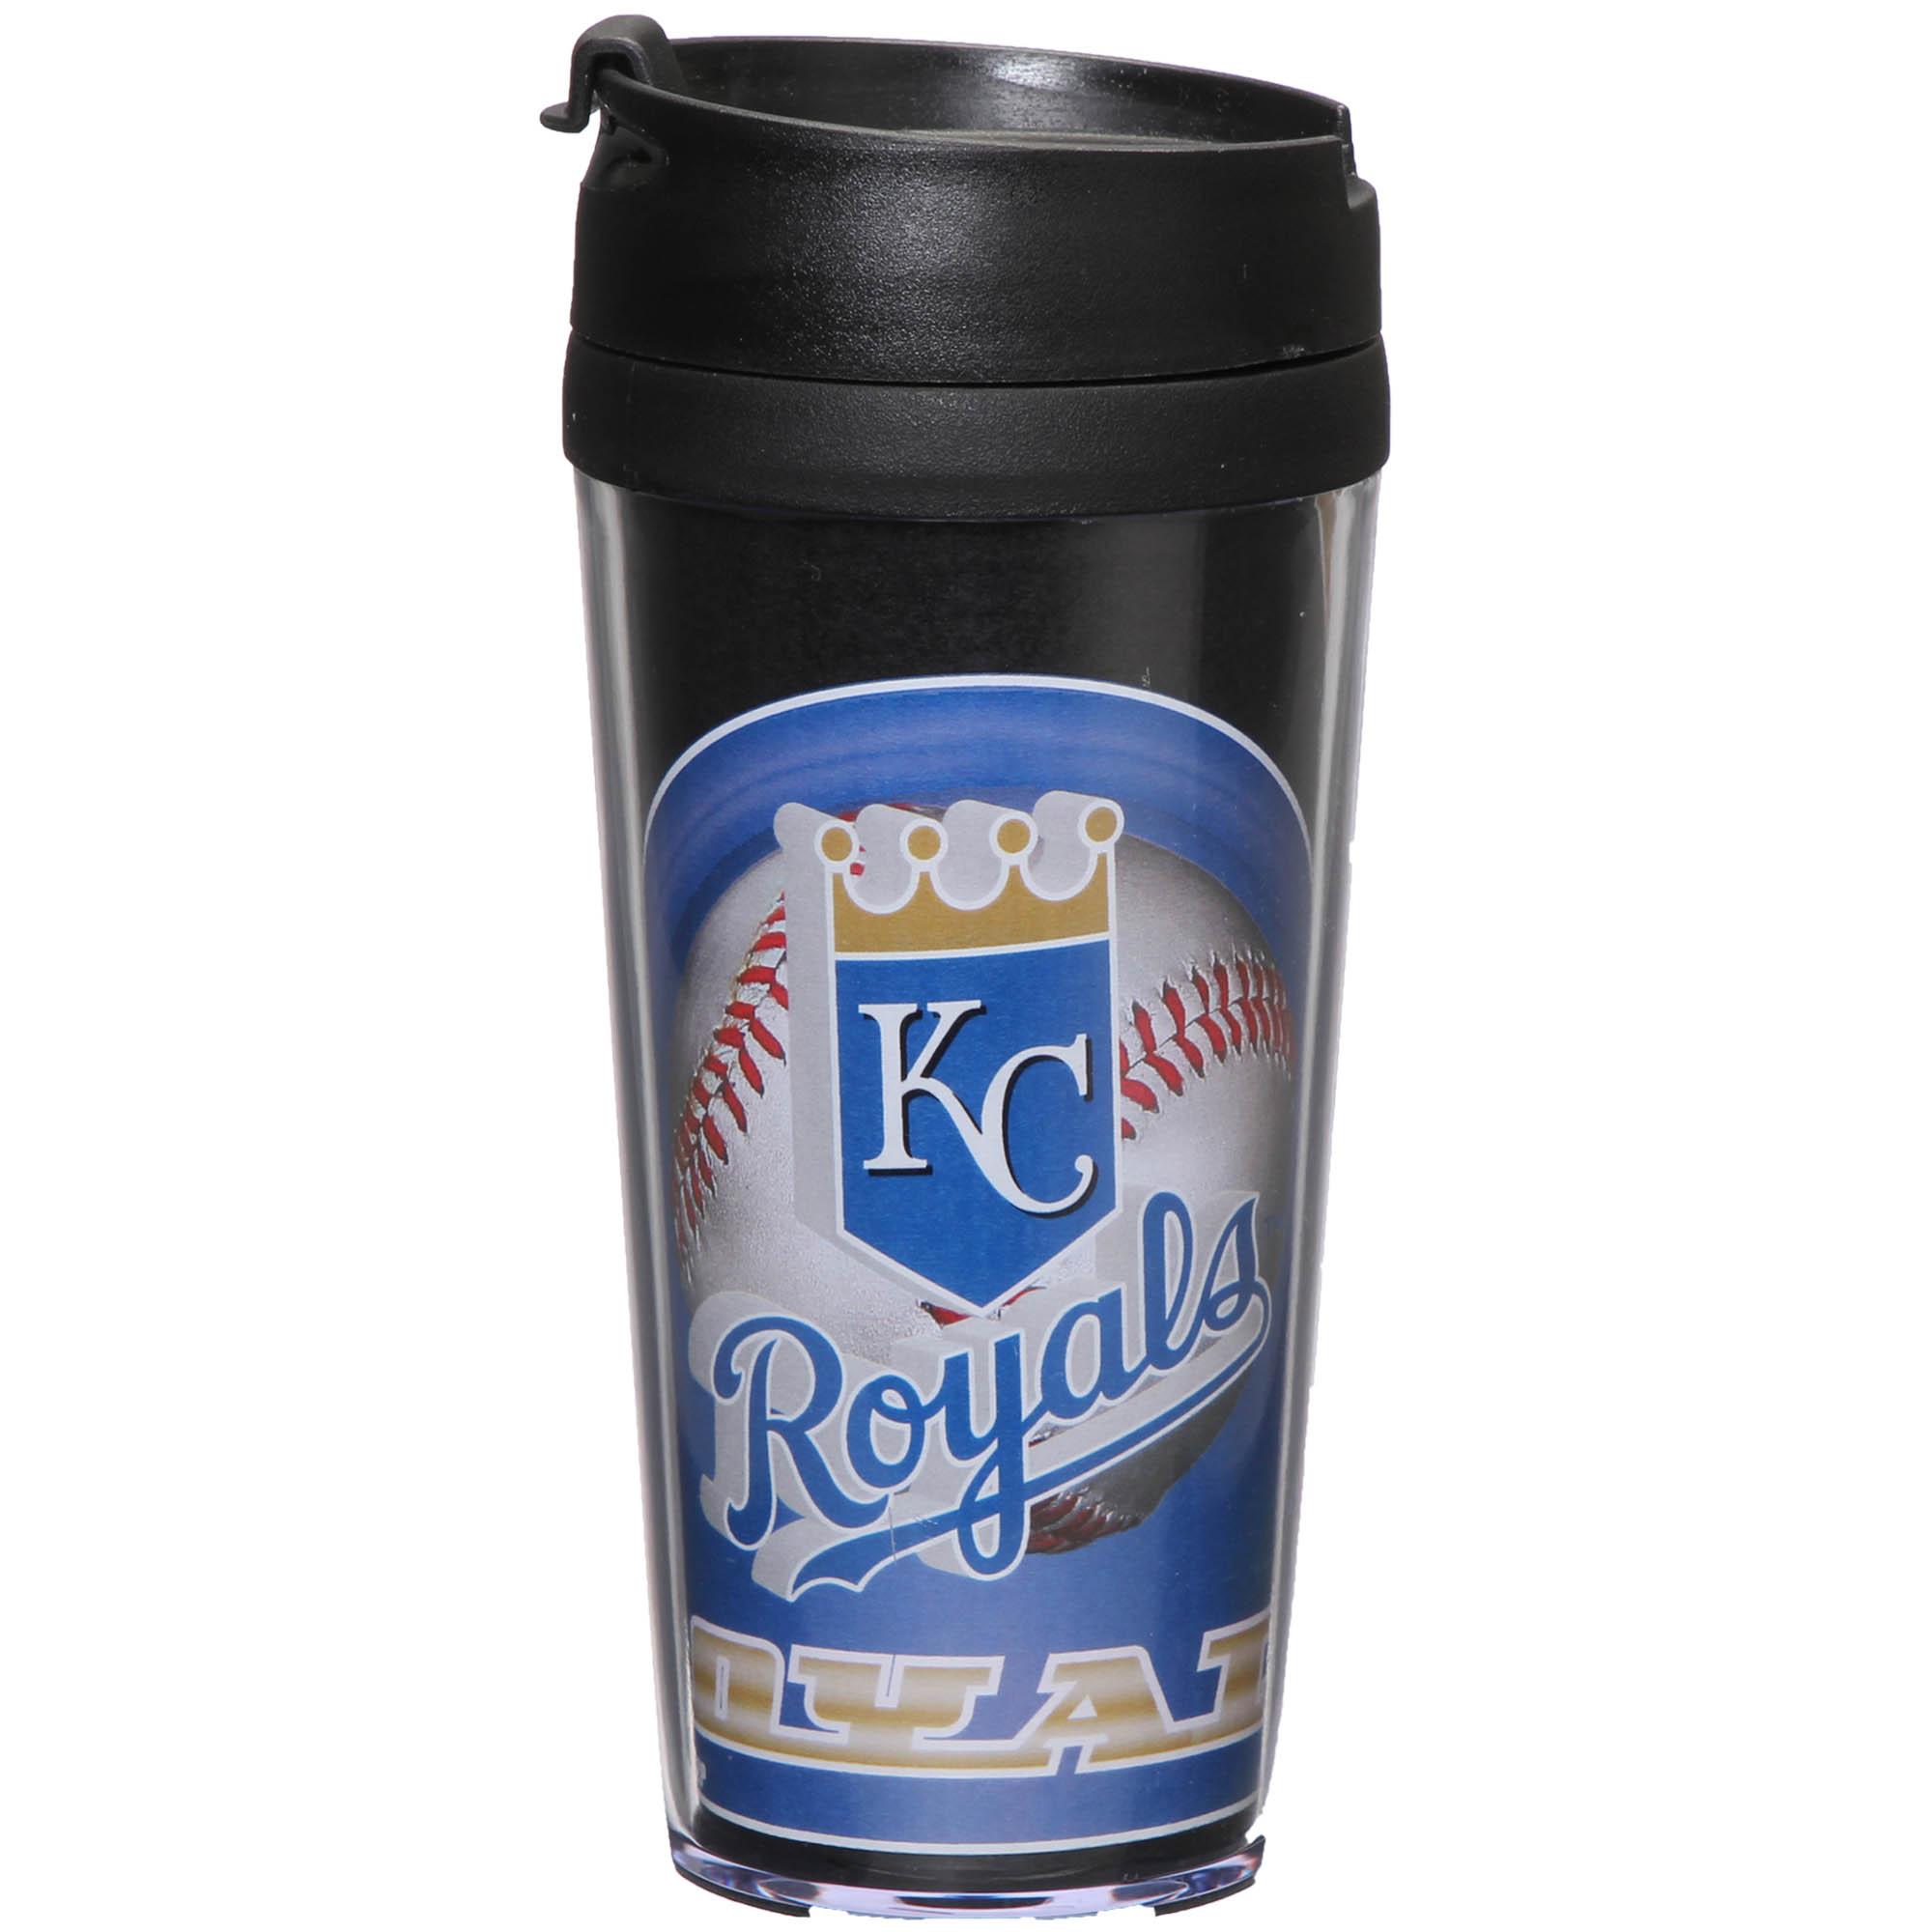 Kansas City Royals 16oz. Snapfit Tumbler - No Size